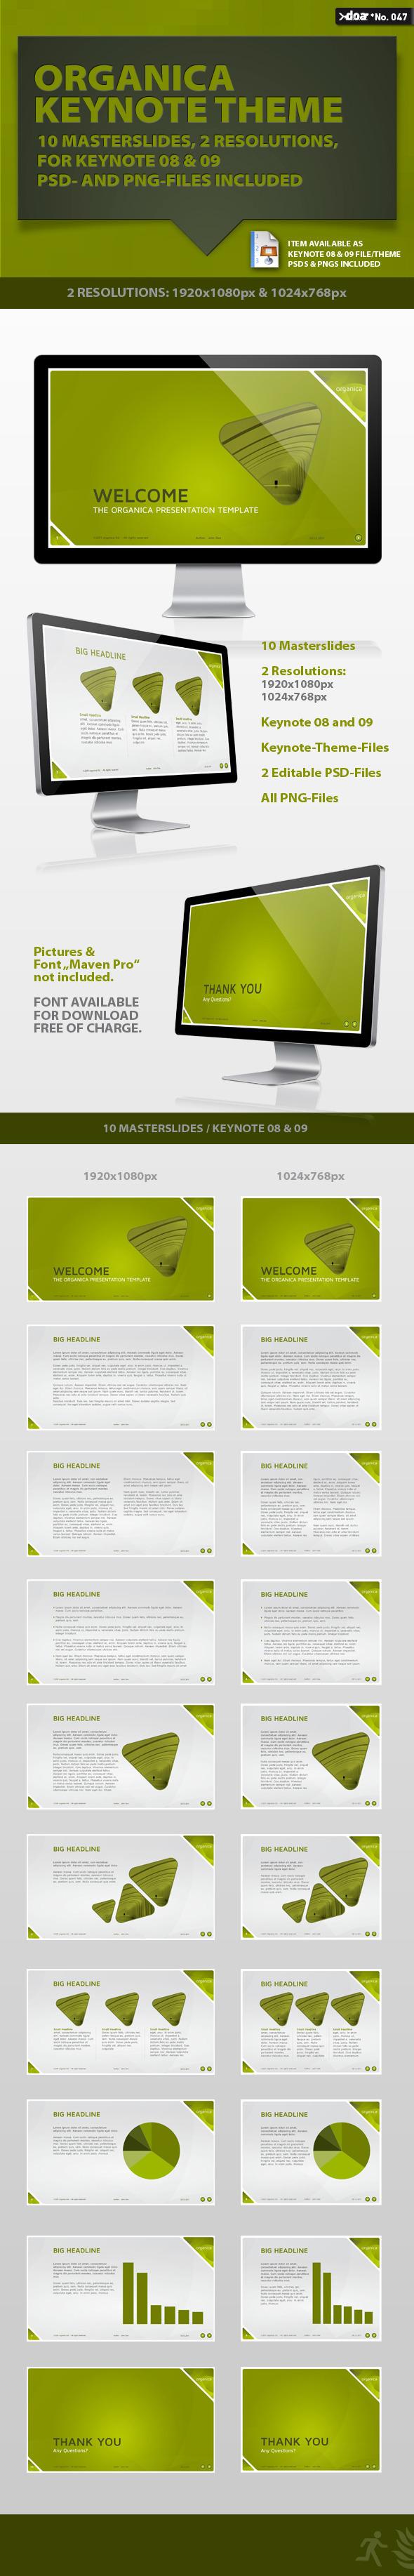 Organica Keynote Theme - Keynote Templates Presentation Templates